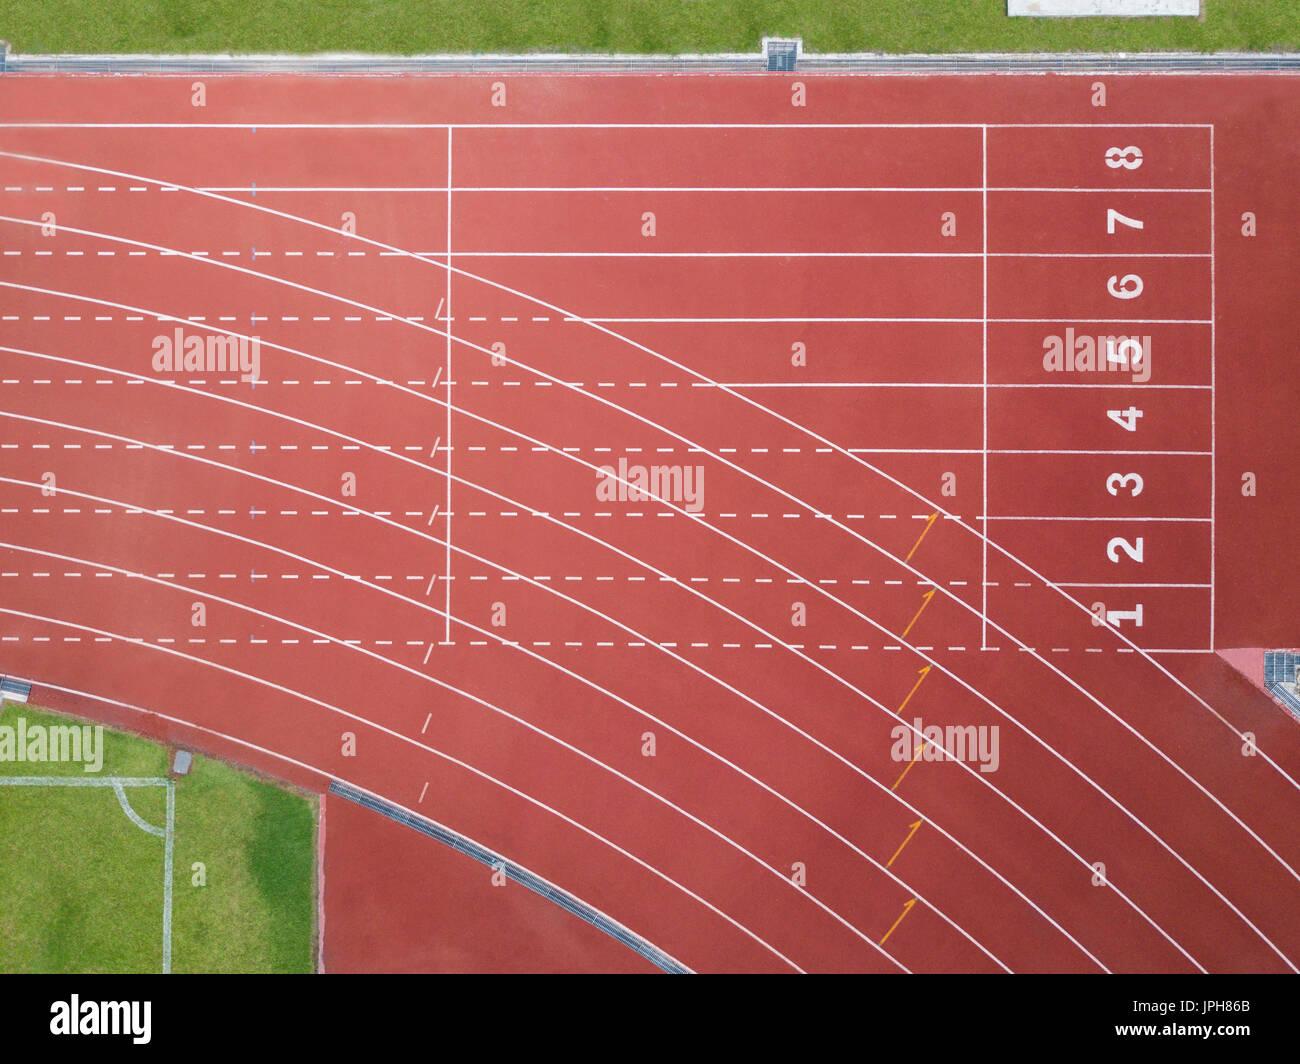 Punto de partida con pista de atletismo lane números Imagen De Stock